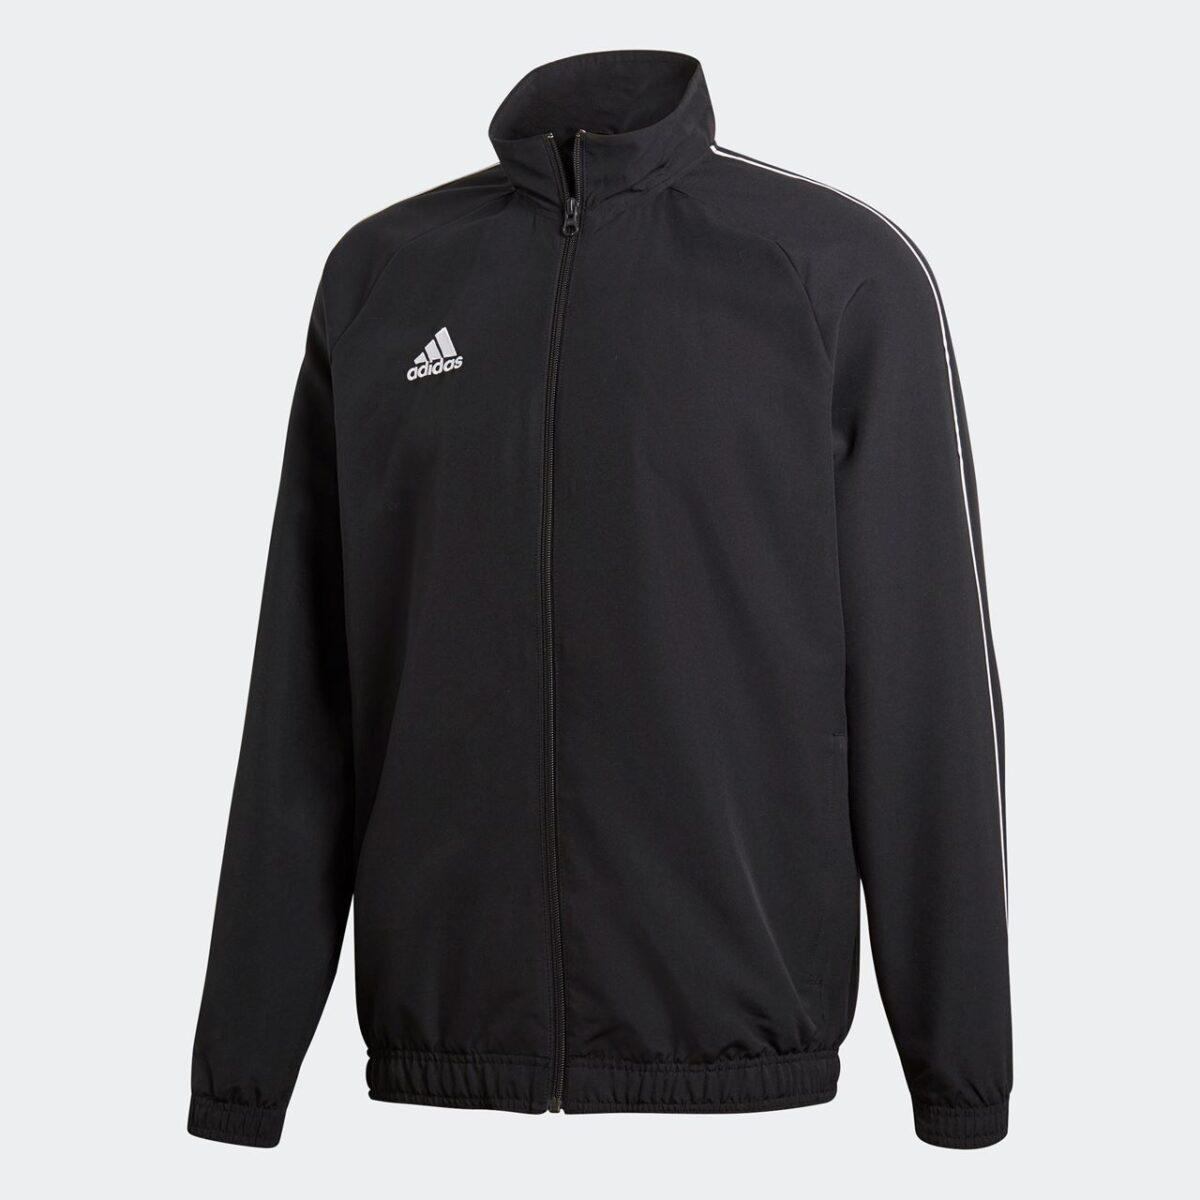 Adidas Core 18 Presentation Jacket Adult